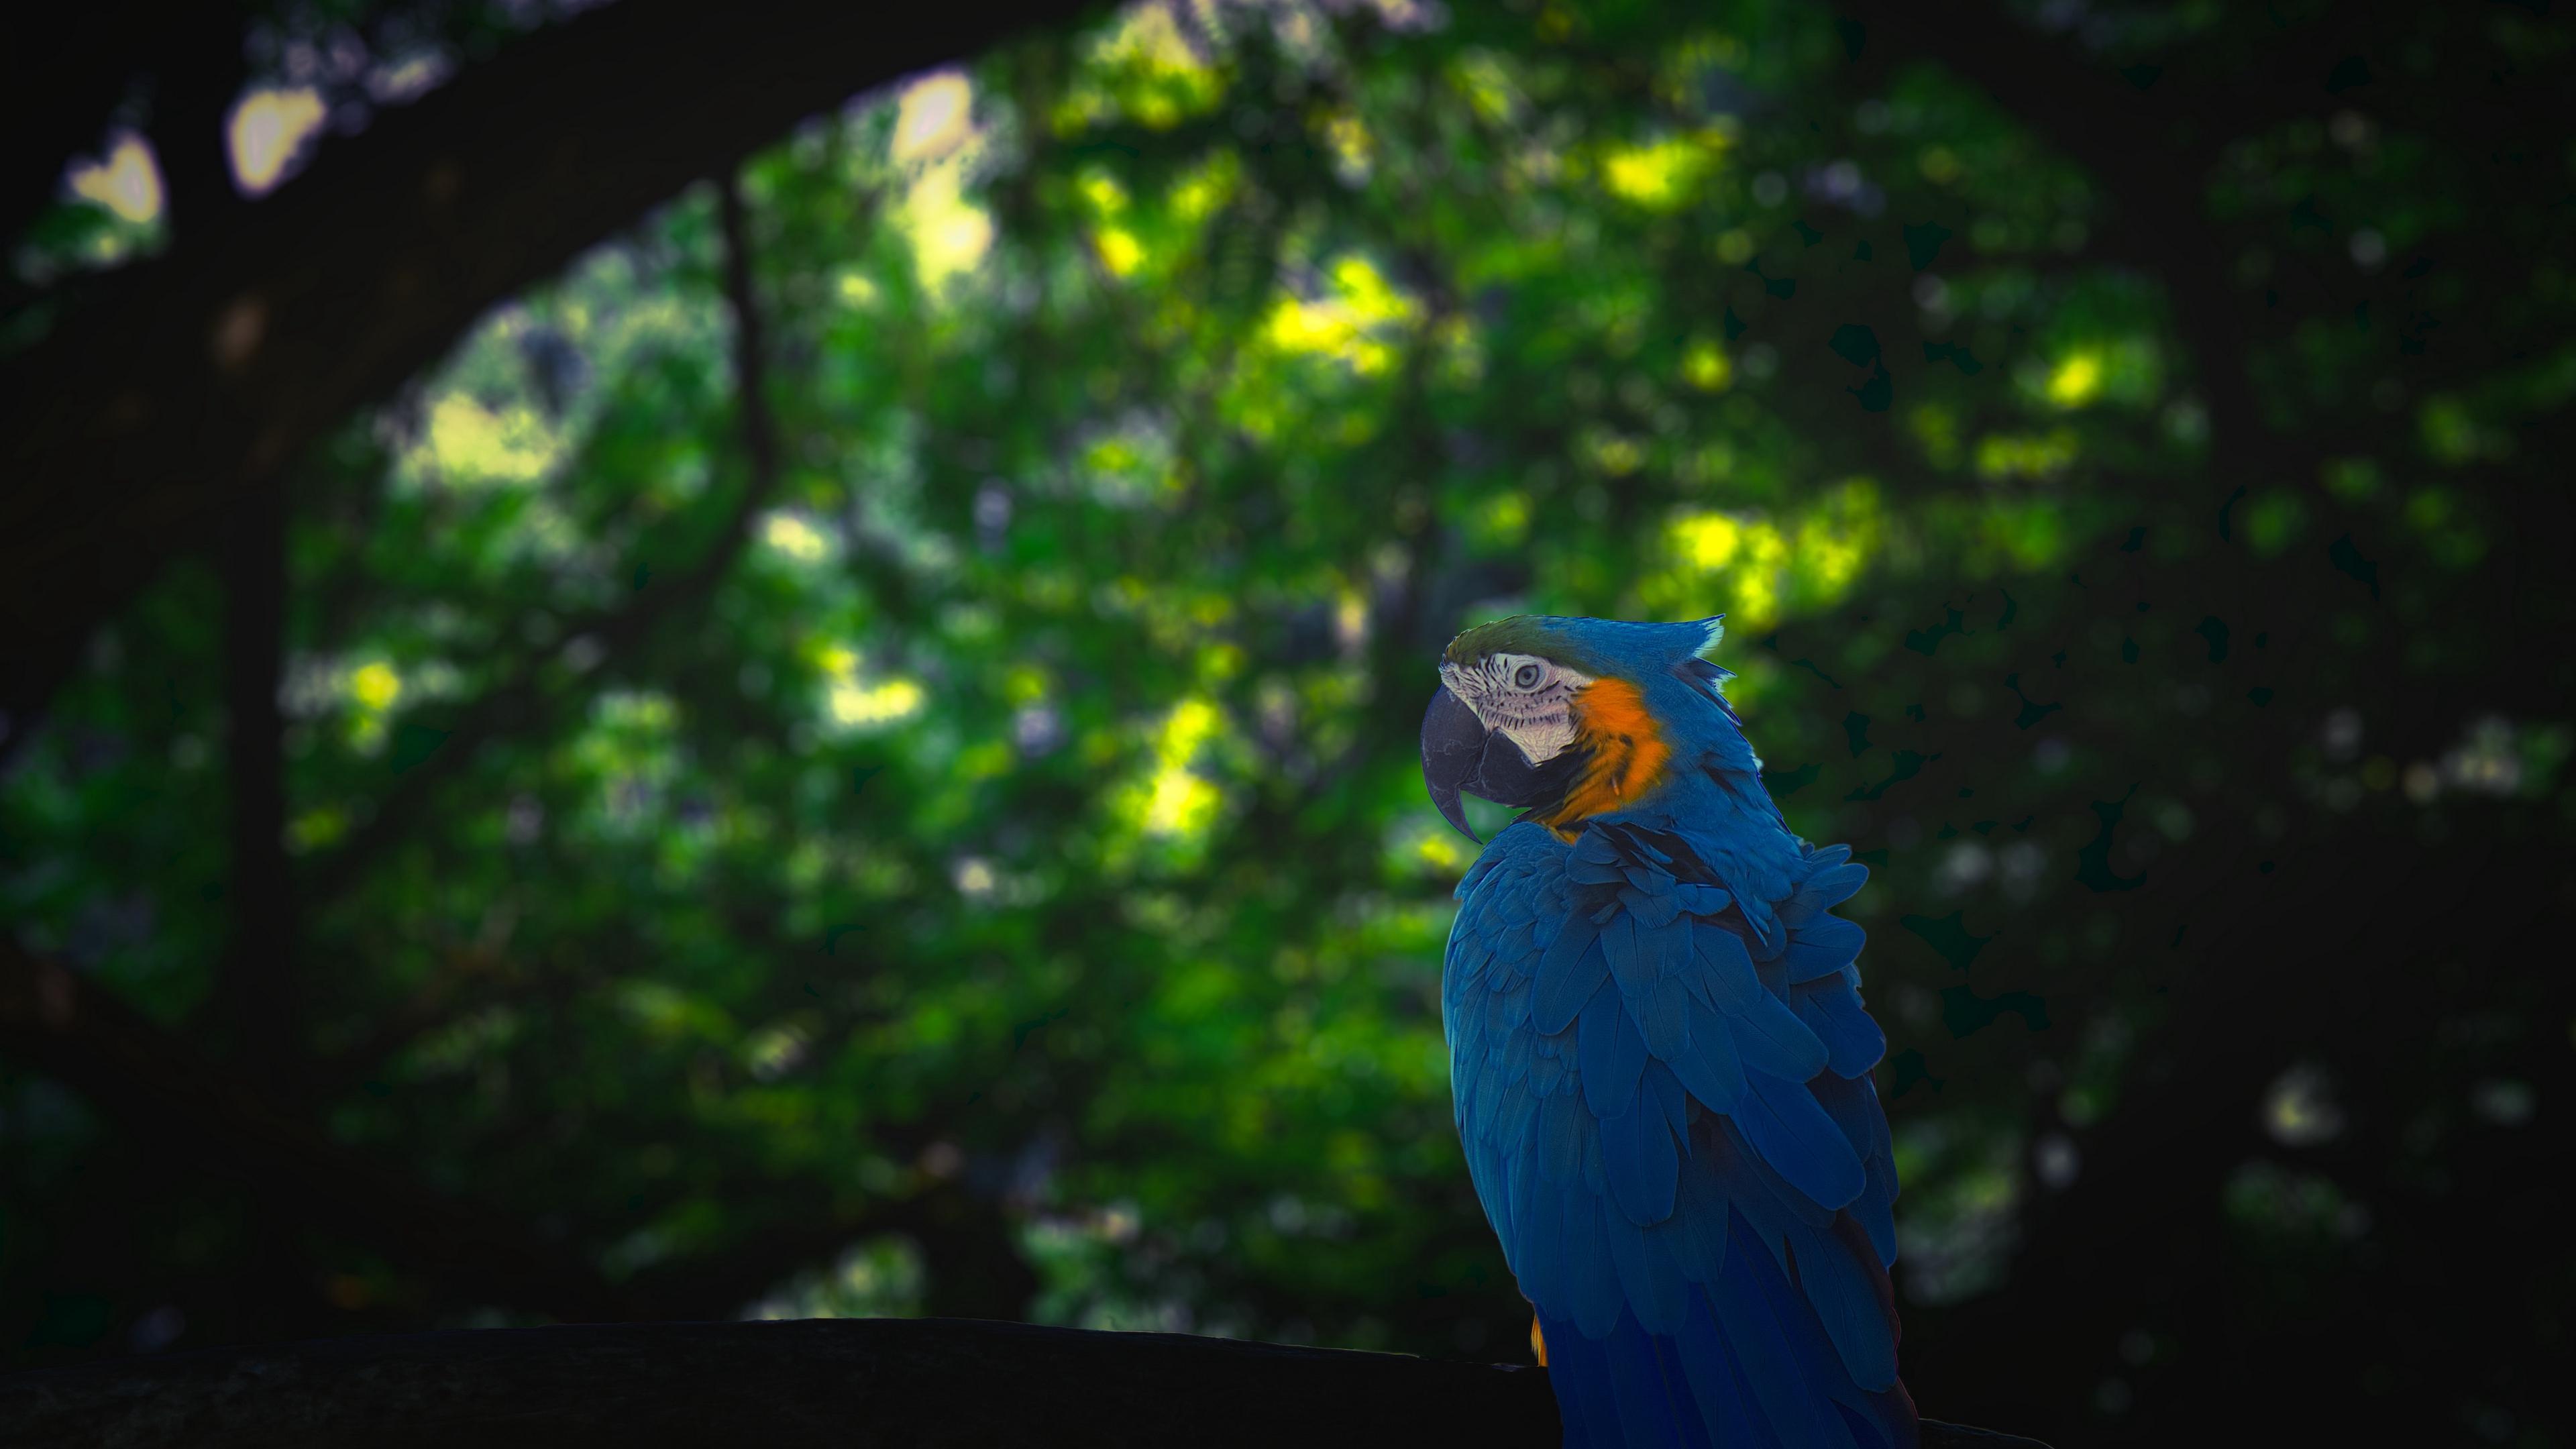 macaw parrot bird jungle 4k 1542242809 - macaw, parrot, bird, jungle 4k - Parrot, Macaw, Bird